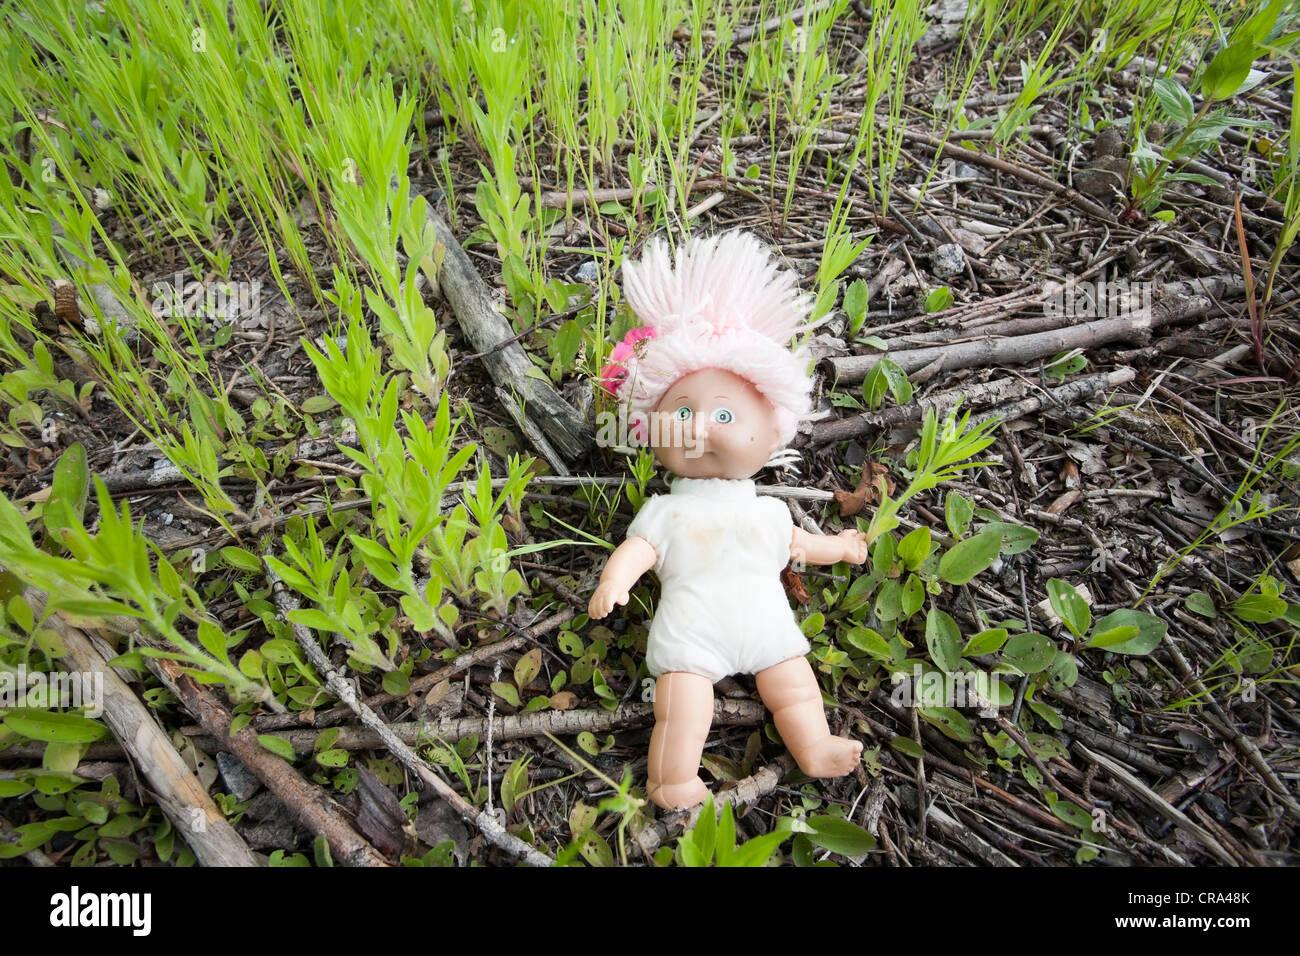 verlorene Puppe auf Boden Stockbild